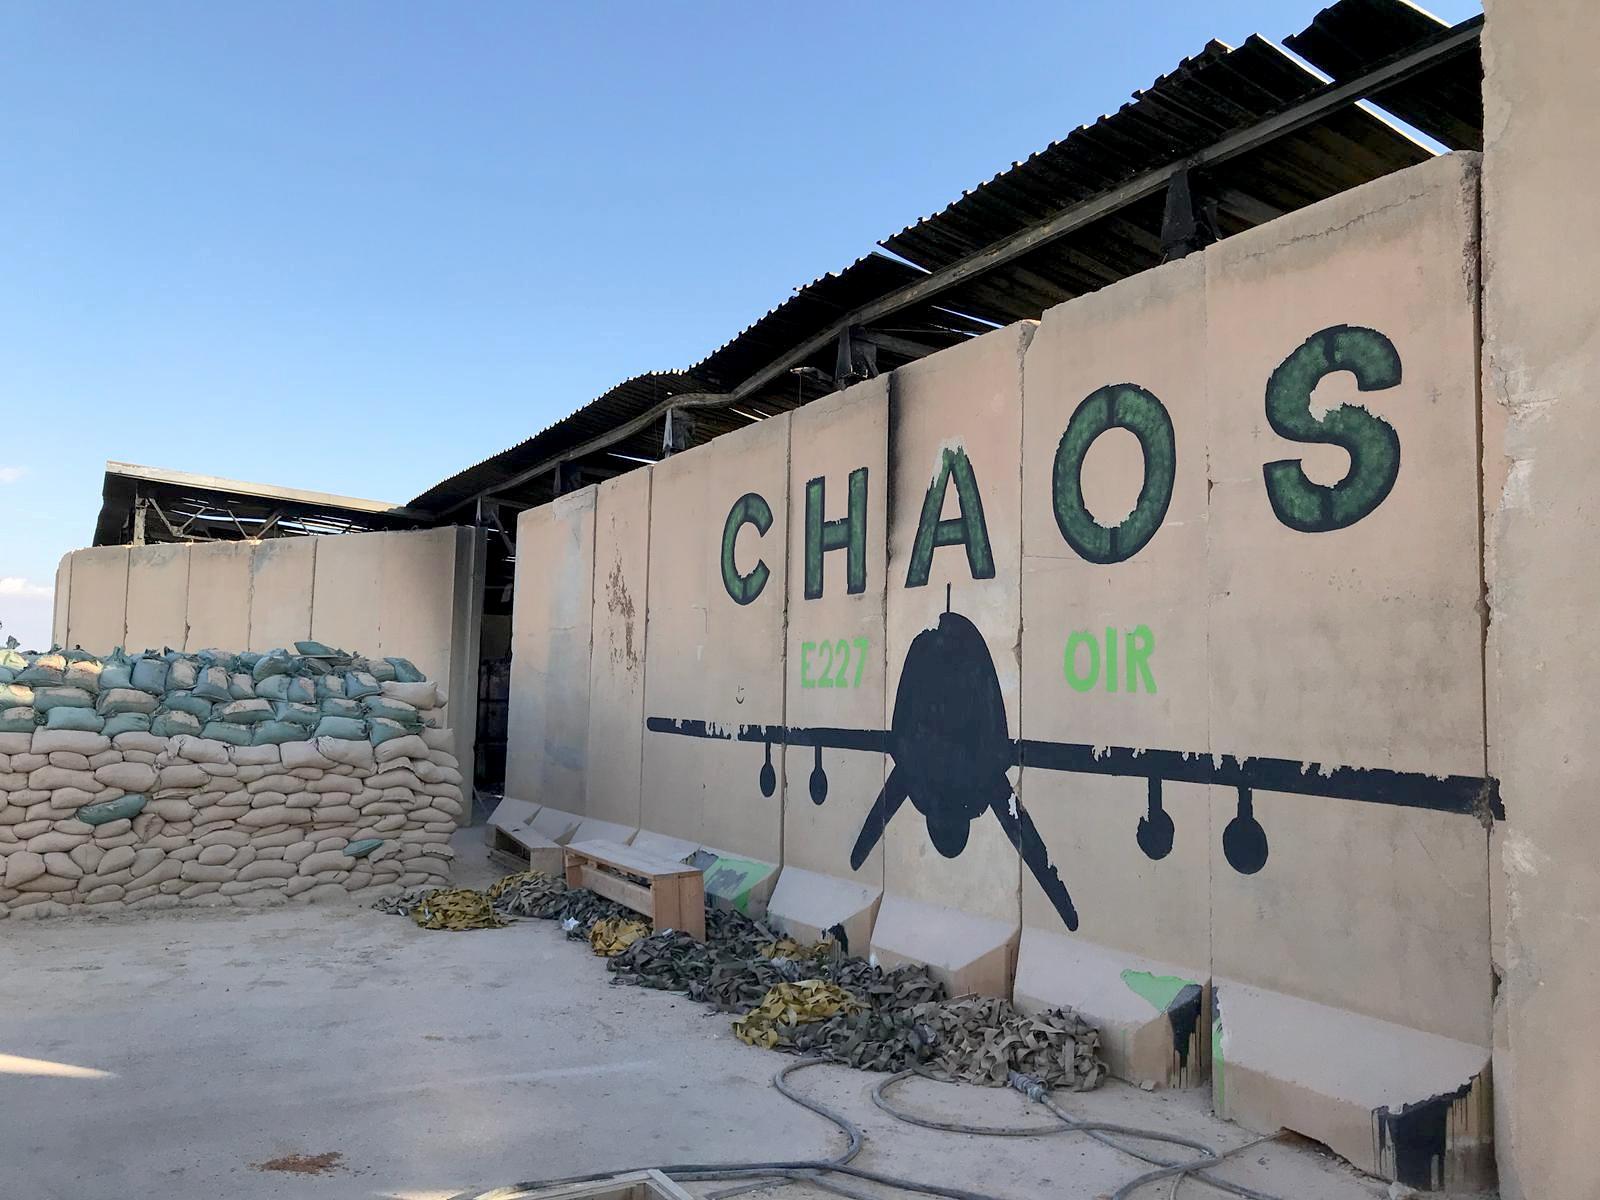 Blast walls of a sleeping quarters for U.S. soldiers are seen at Ain al-Asad air base in Anbar province, Iraq January 13, 2020. REUTERS/John Davison